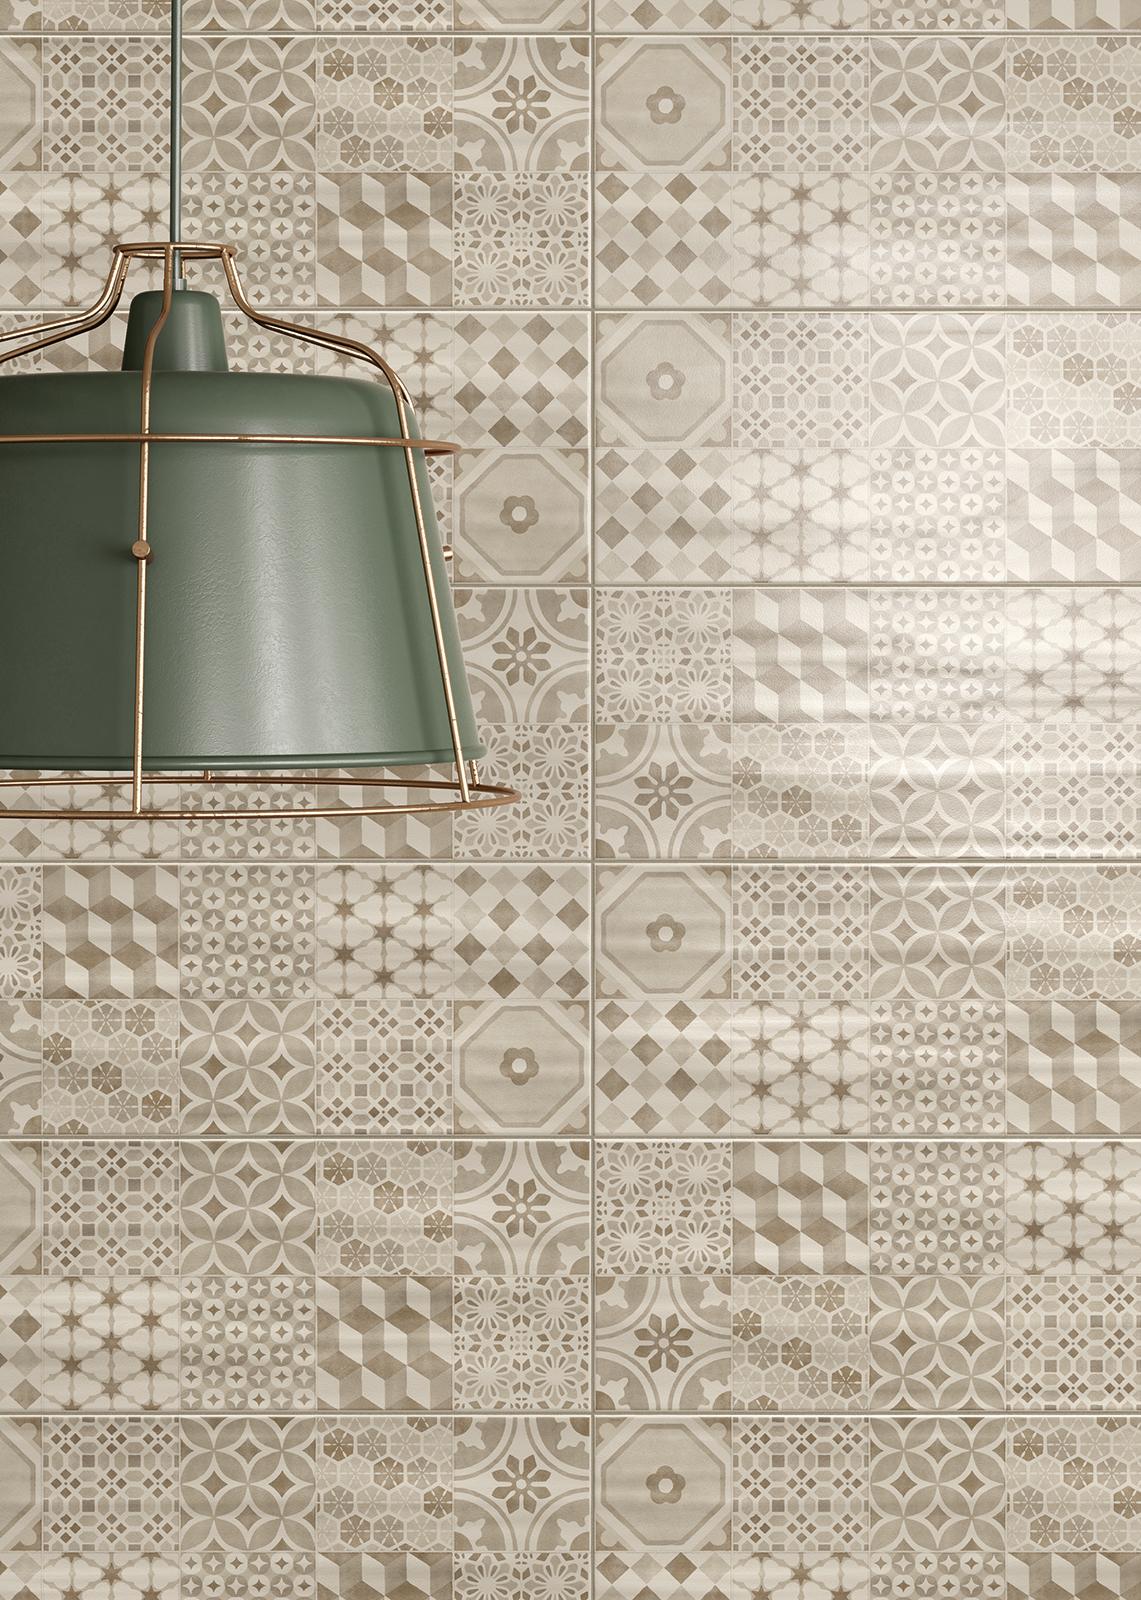 Paint kitchen and bathroom wall tiling marazzi paint ceramic tiles marazzi7077 doublecrazyfo Gallery